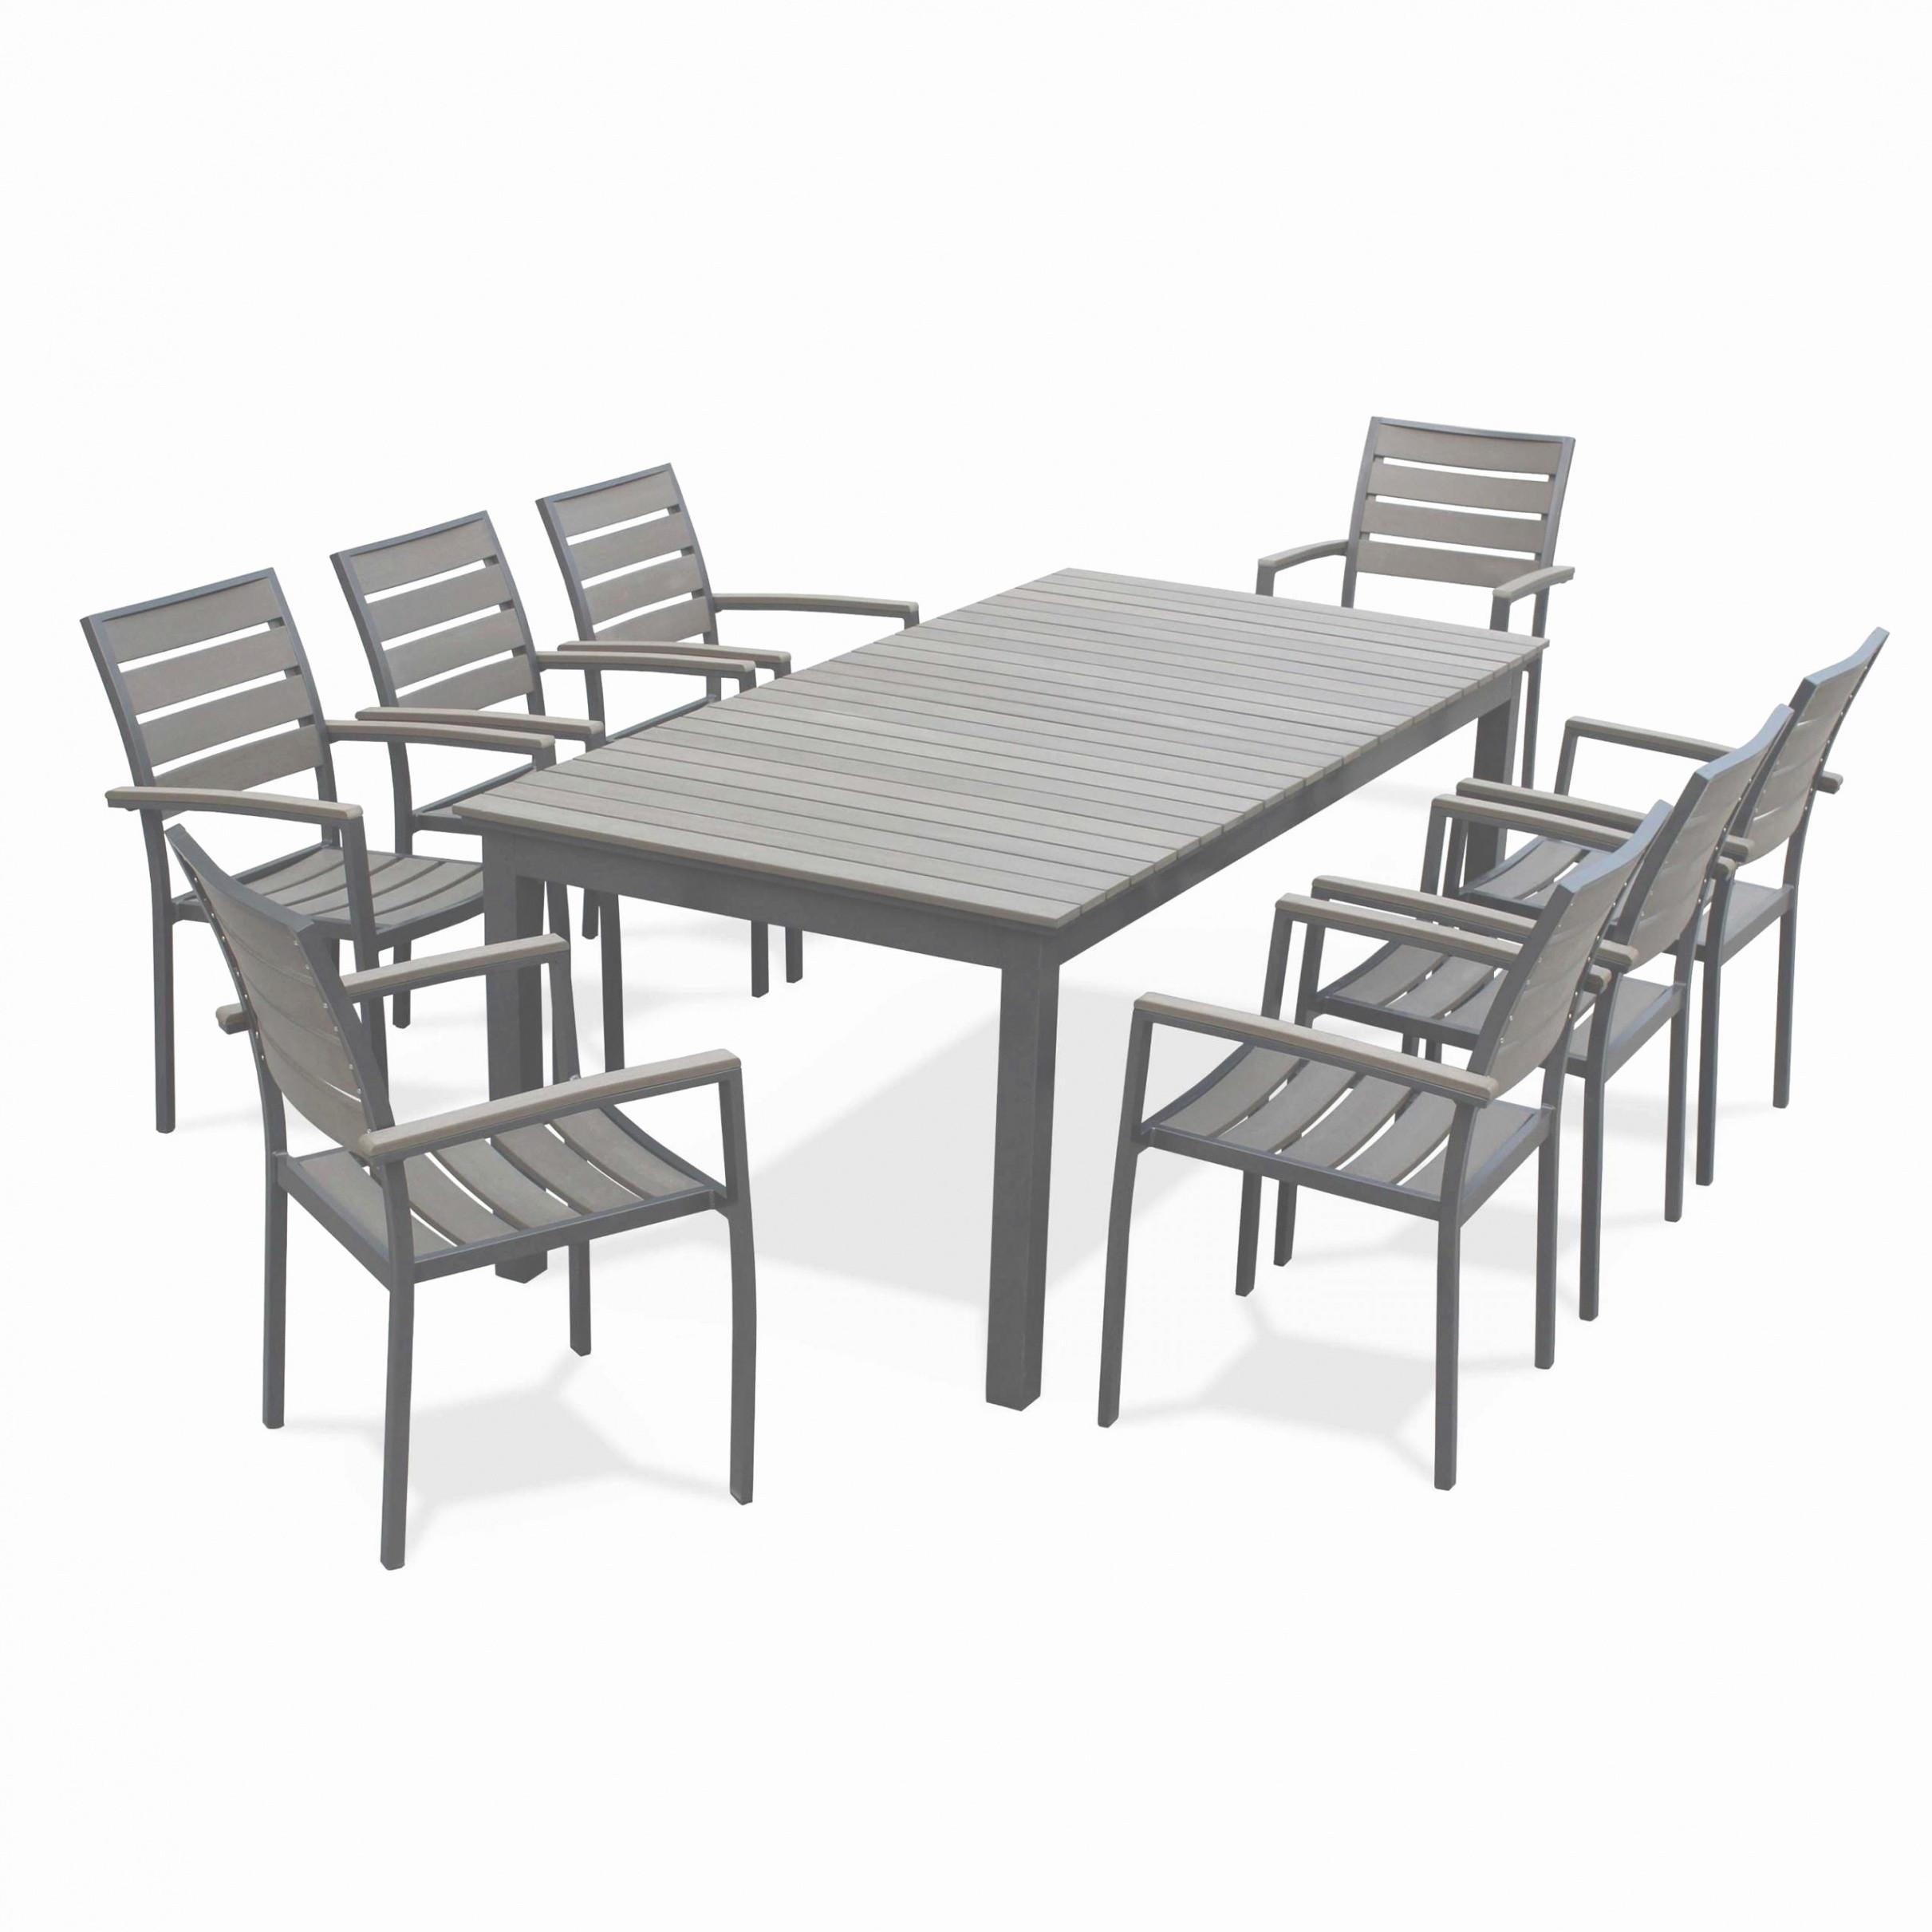 cdiscount table et chaise table jardin acacia laguerredesmots of cdiscount table et chaise